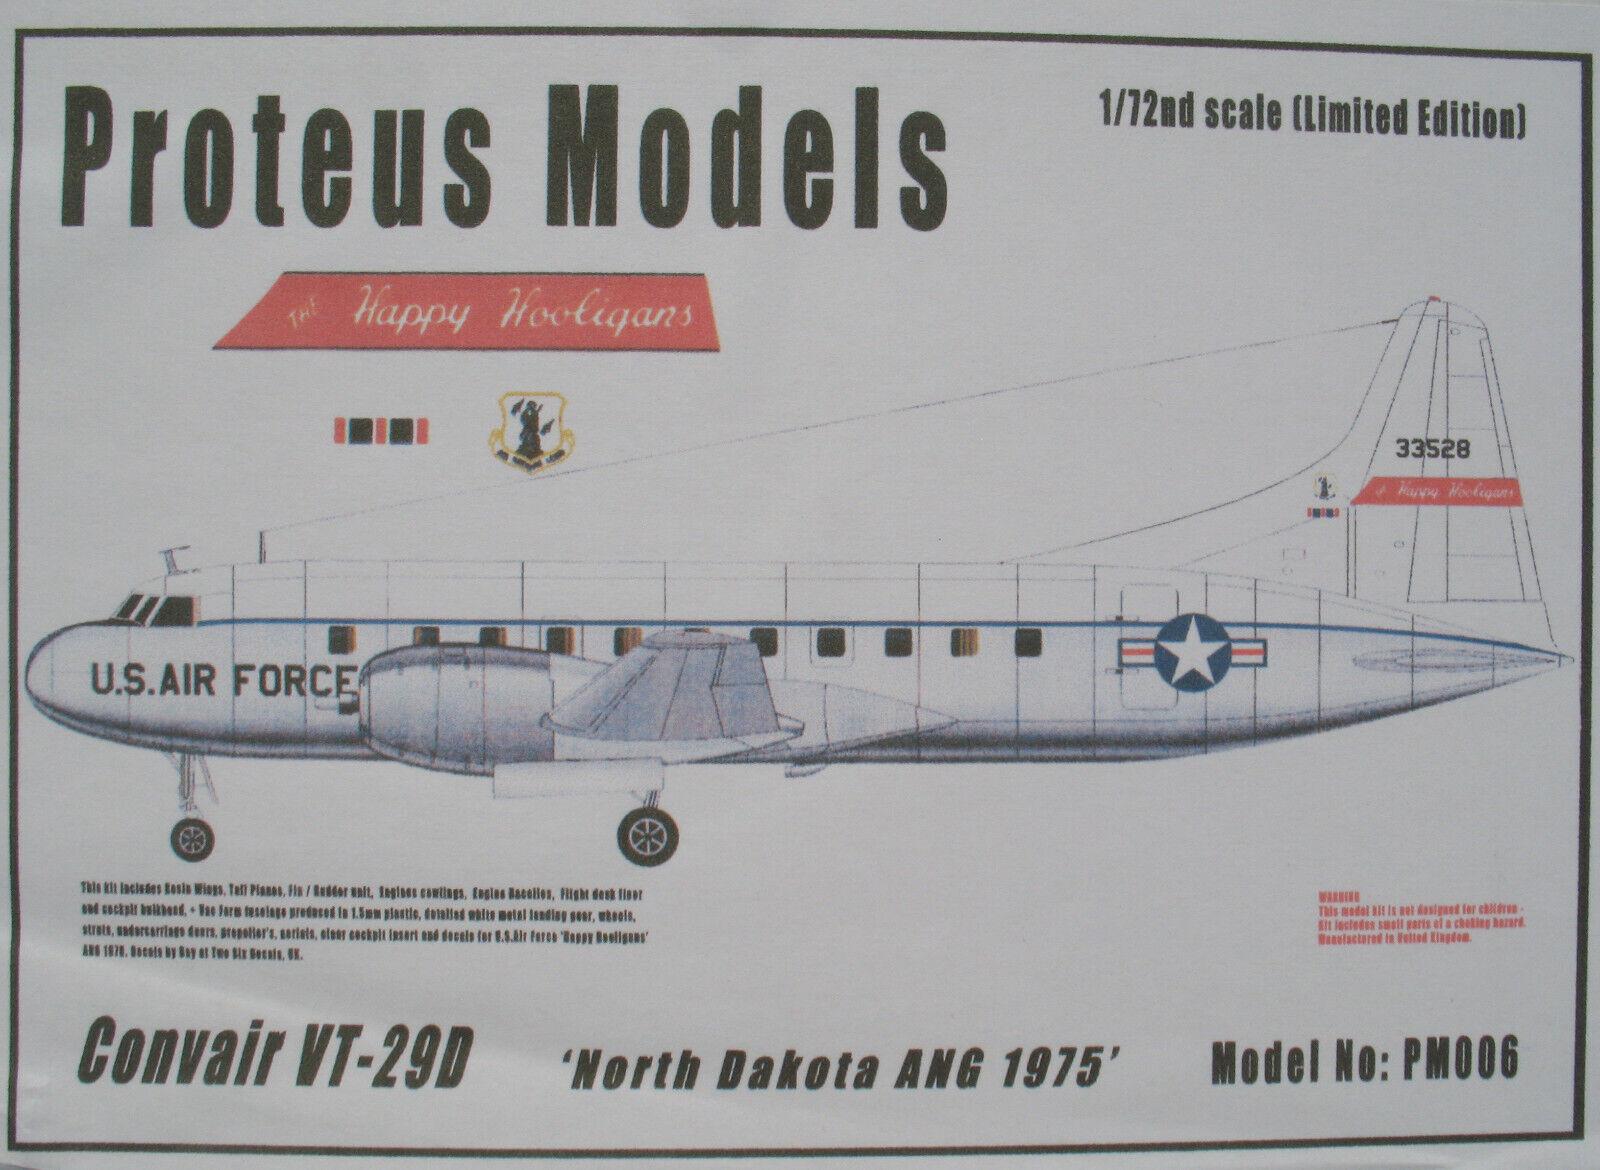 PROTEUS MODELS PM006 - Convair VT-29D US AIR FORCE  Happy Hooligans  - 1 72 Kit